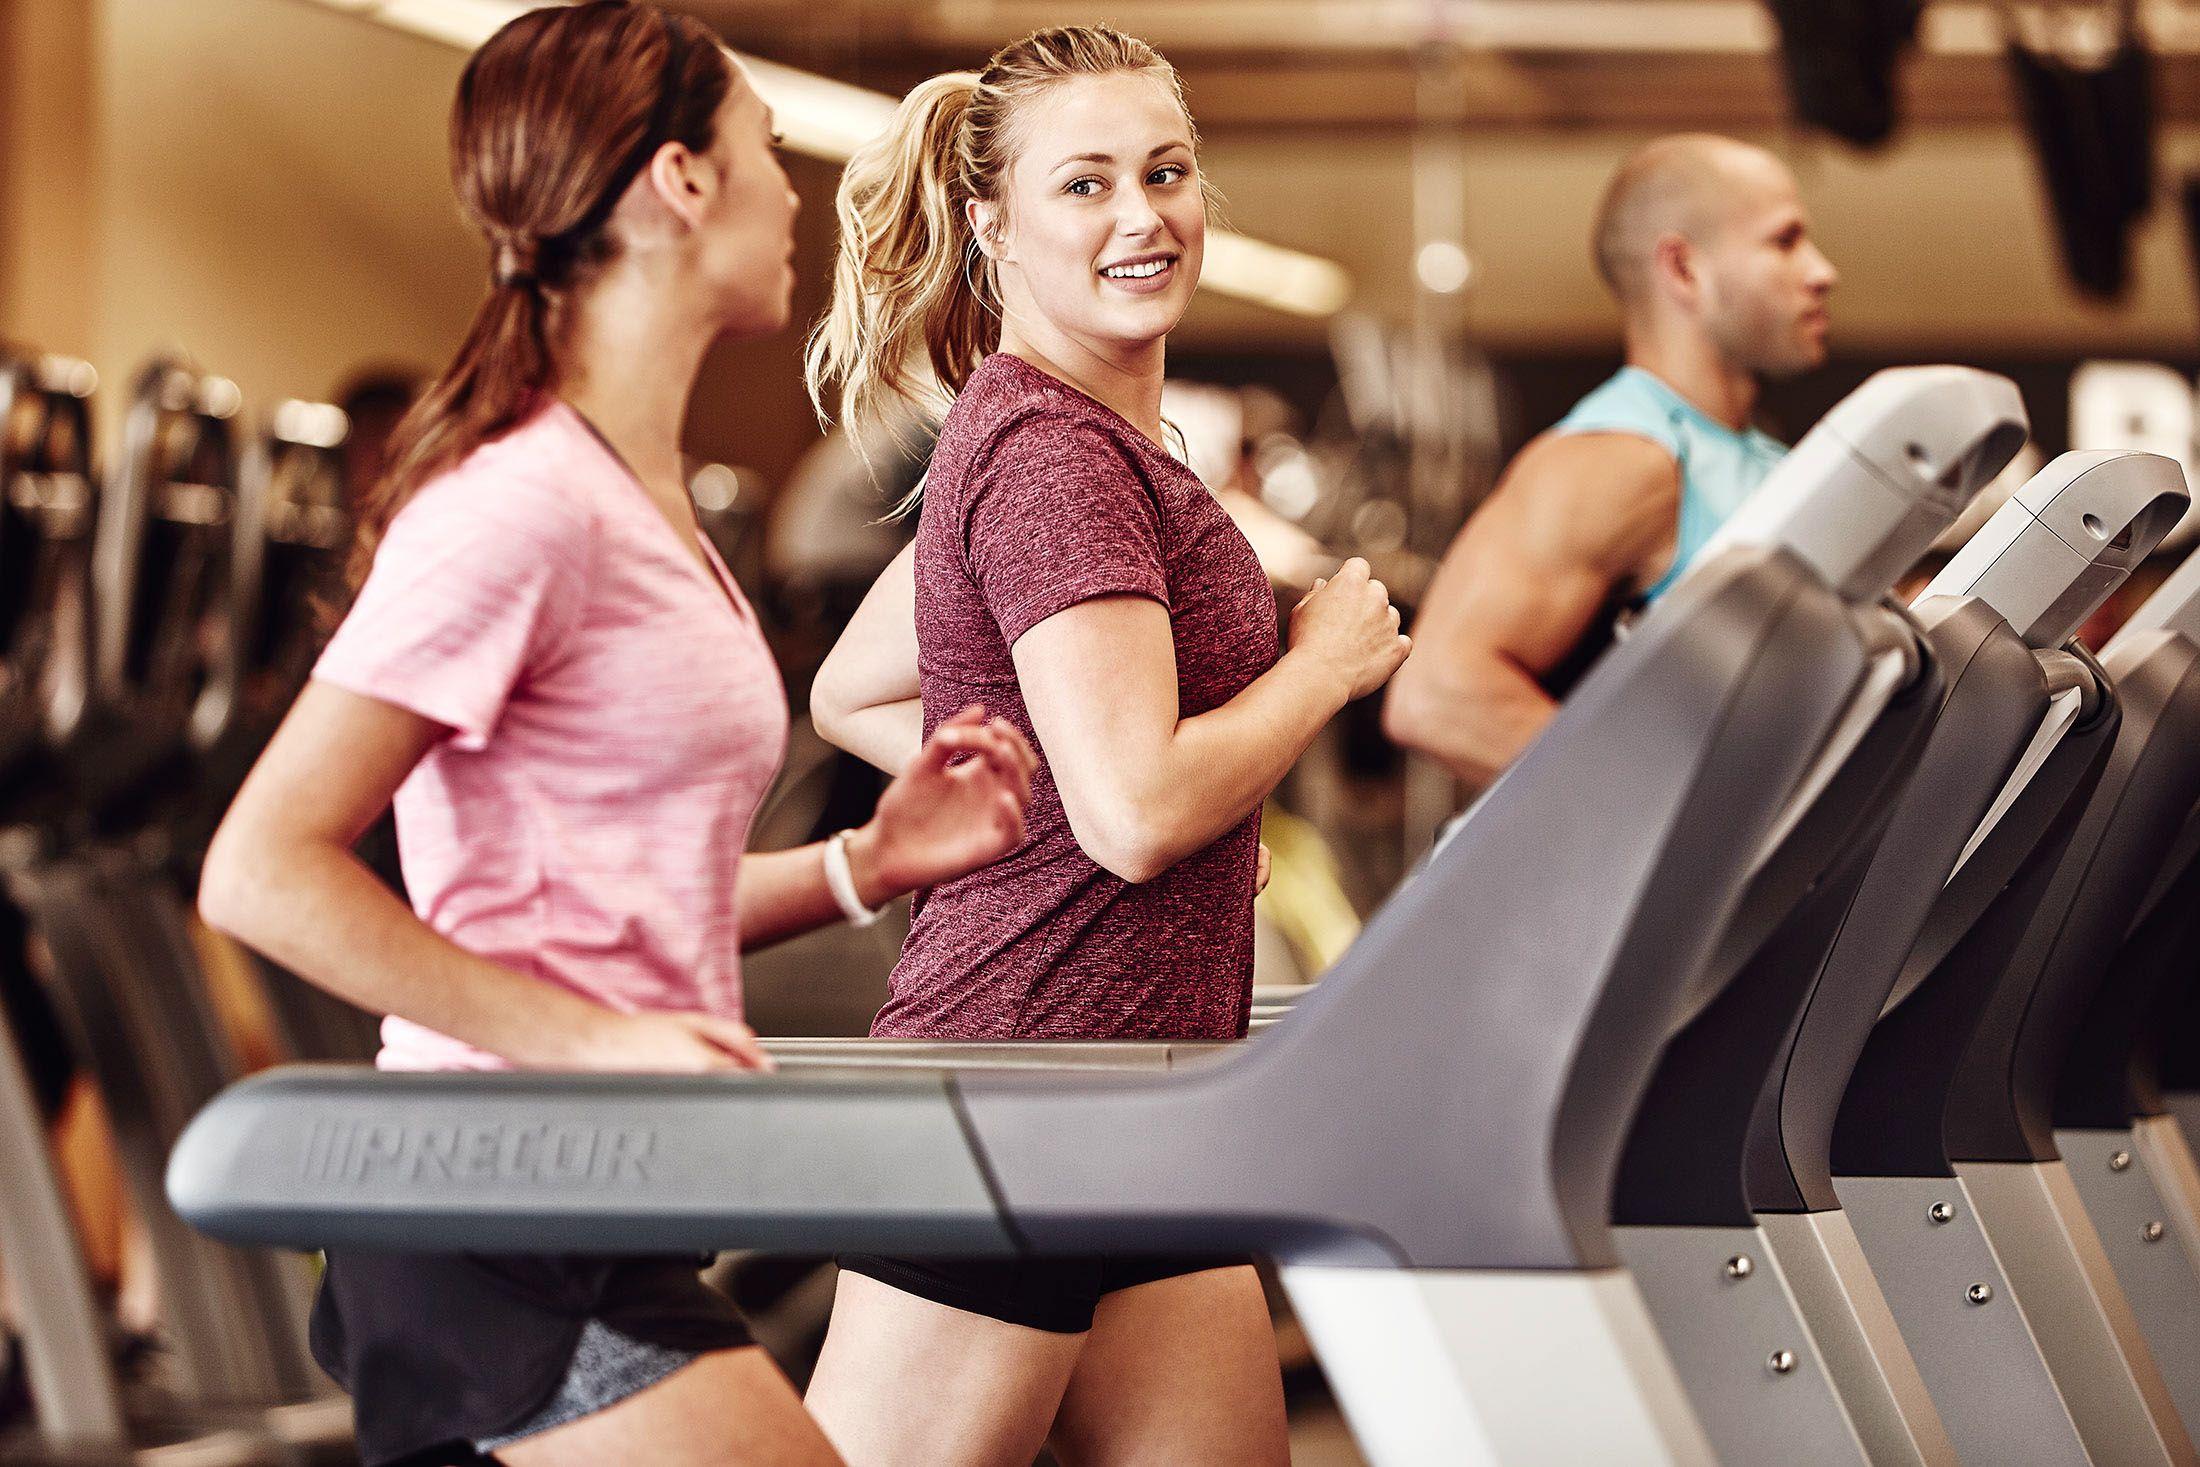 24 Hour Fitness Master Brand Shoot Imagery